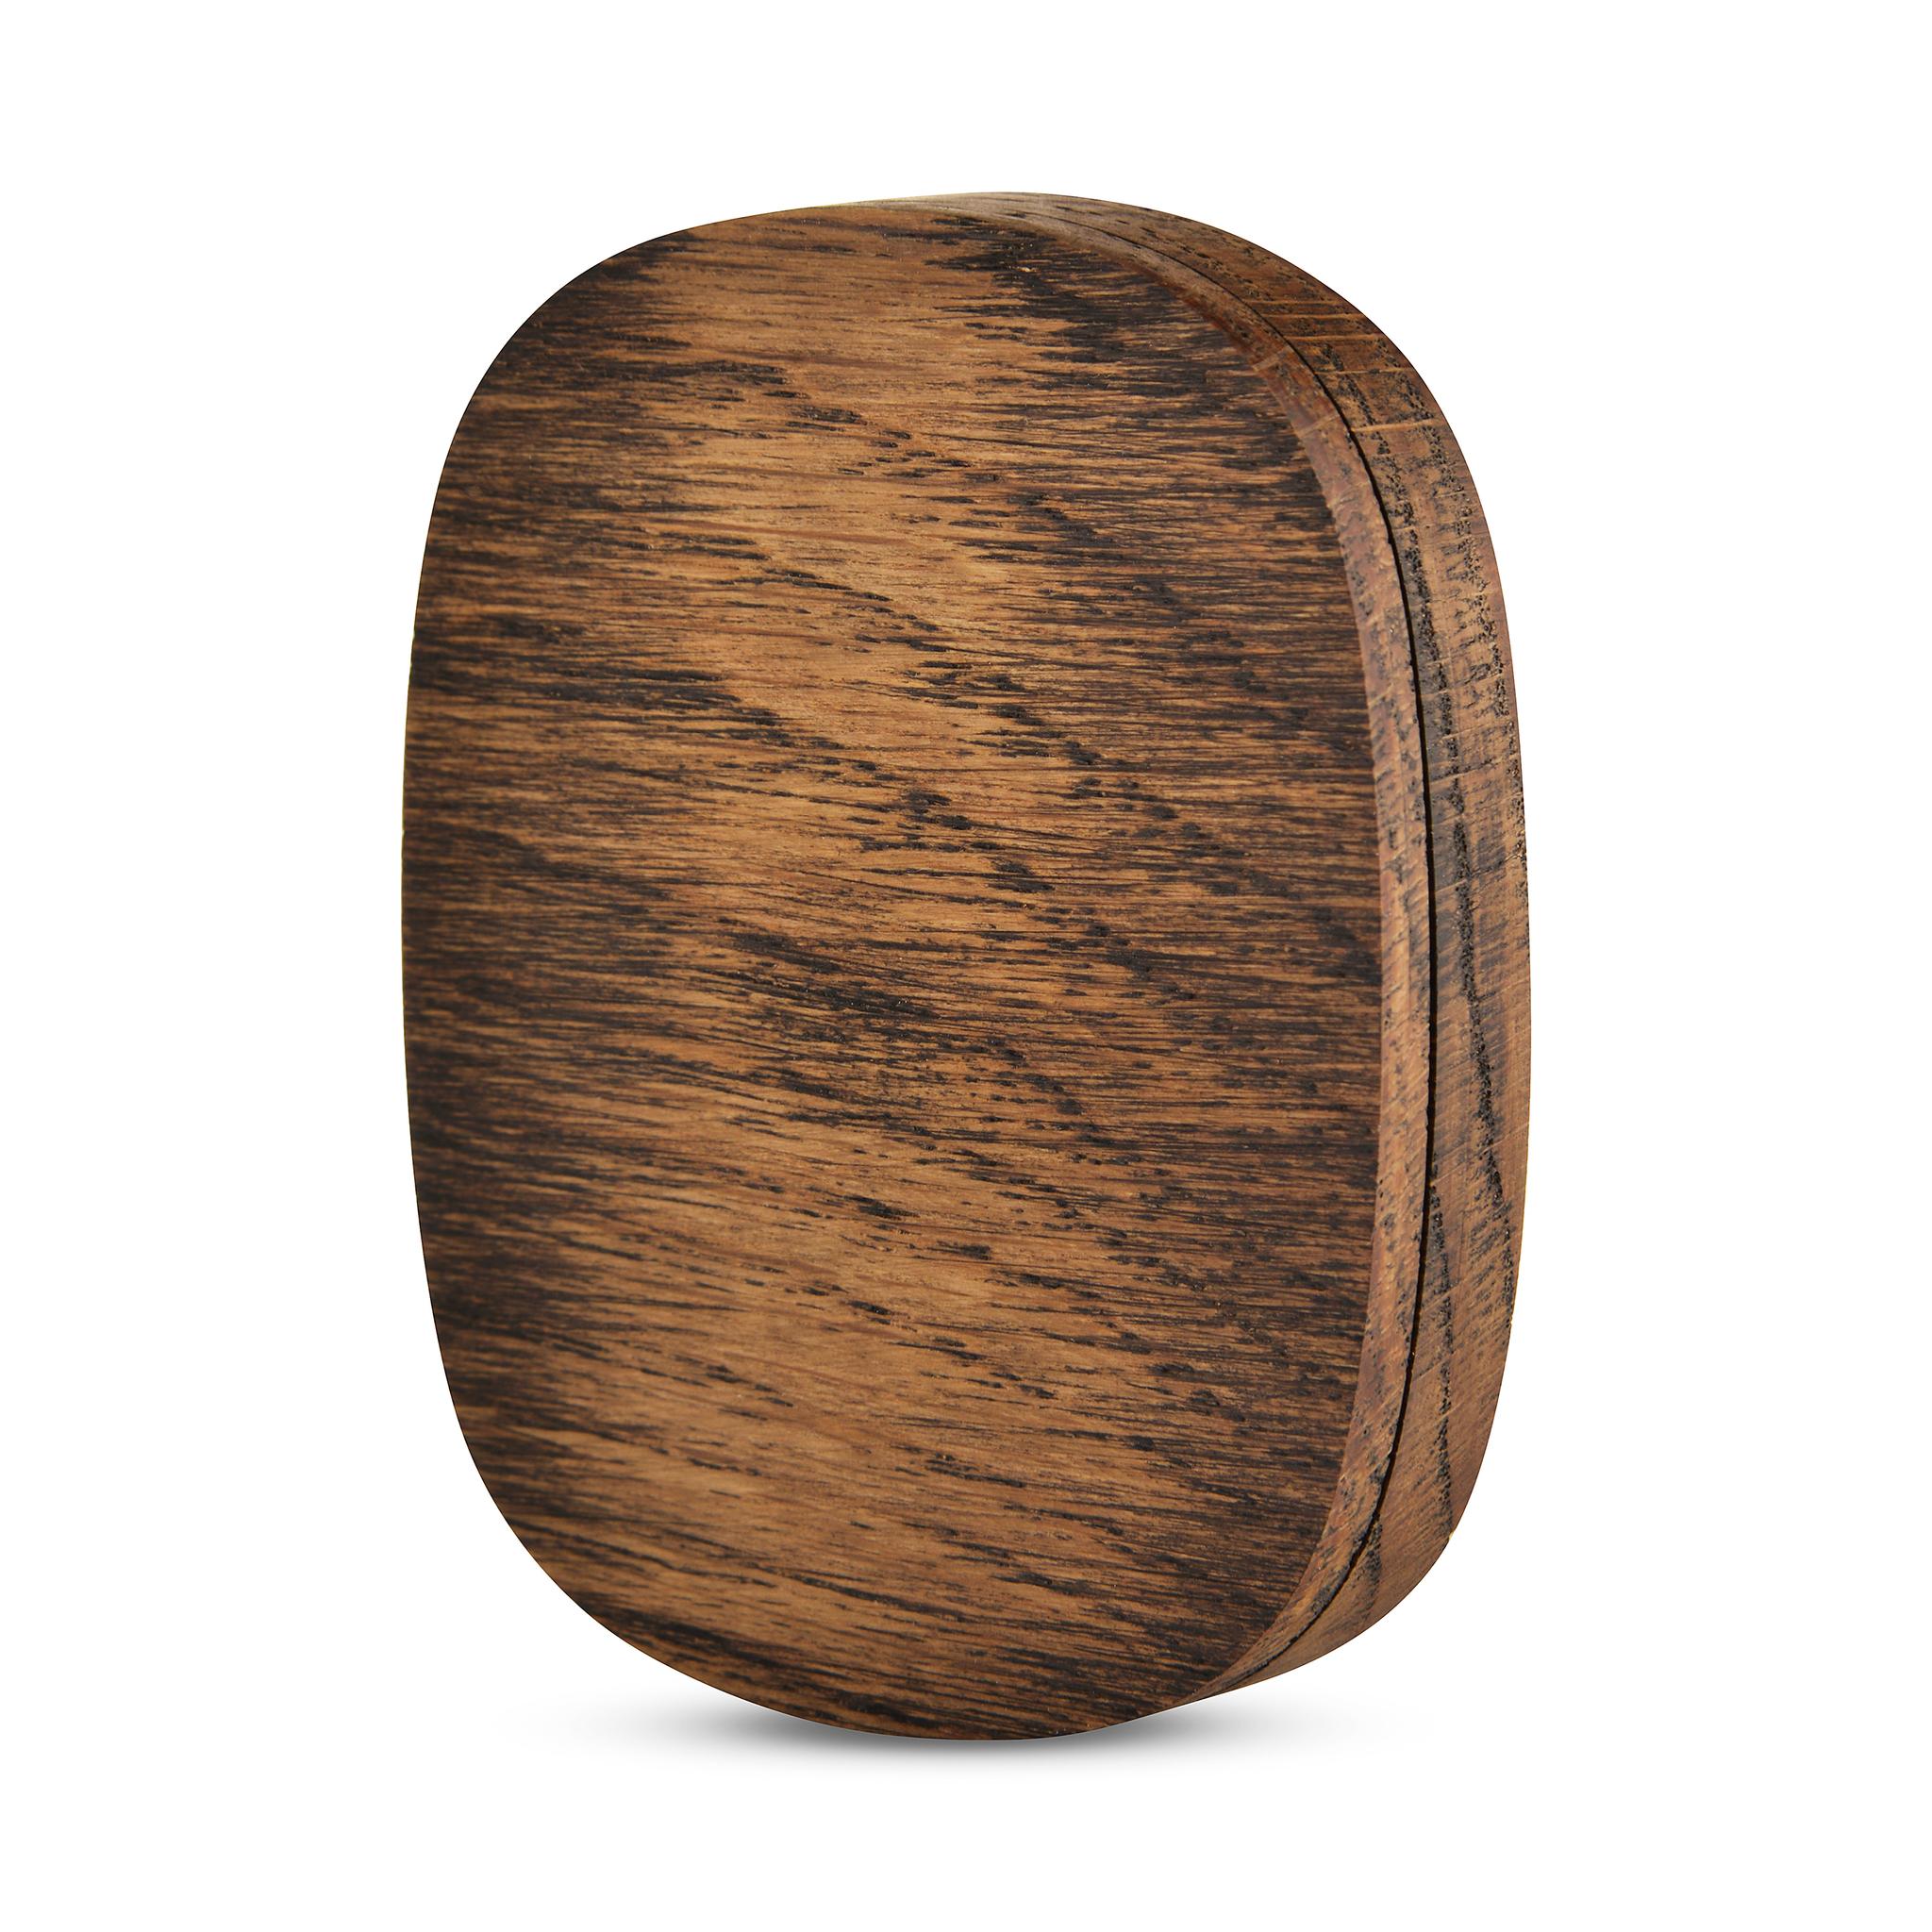 Коробочка из дуба для хранения подвески